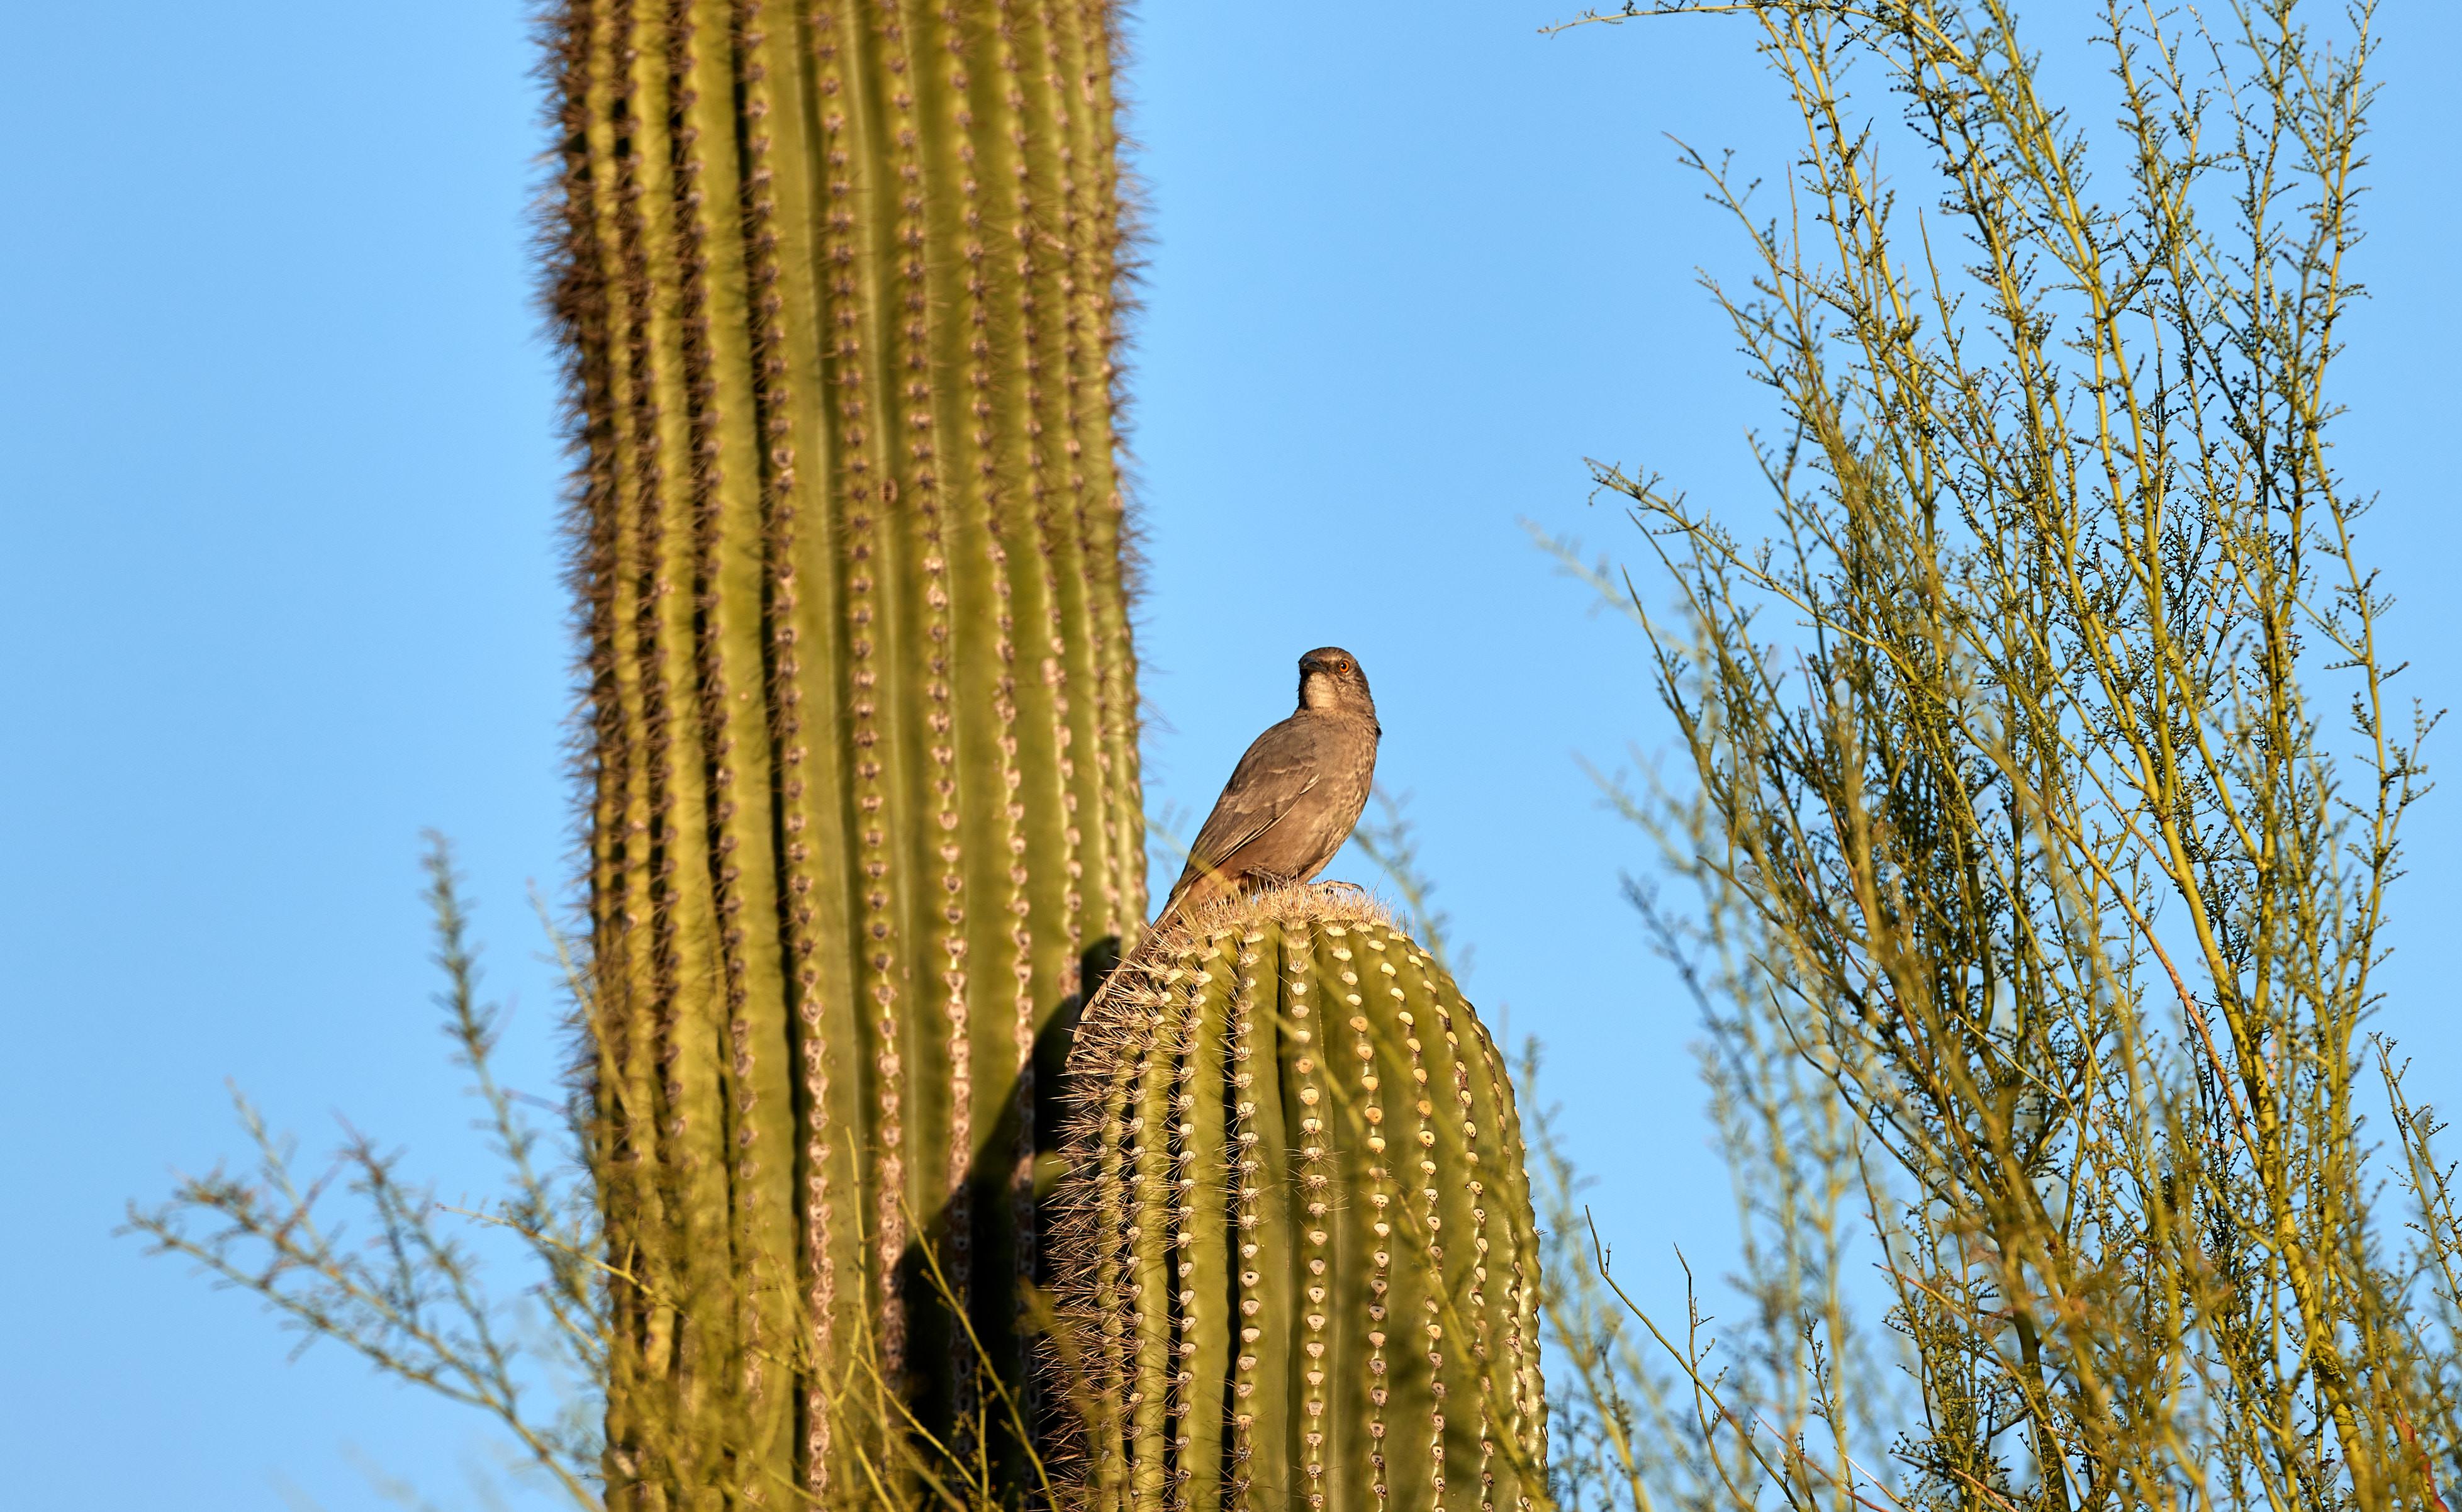 107756 descargar fondo de pantalla Animales, Pájaro, Cactus, Cacto, Espinas, Cielo: protectores de pantalla e imágenes gratis